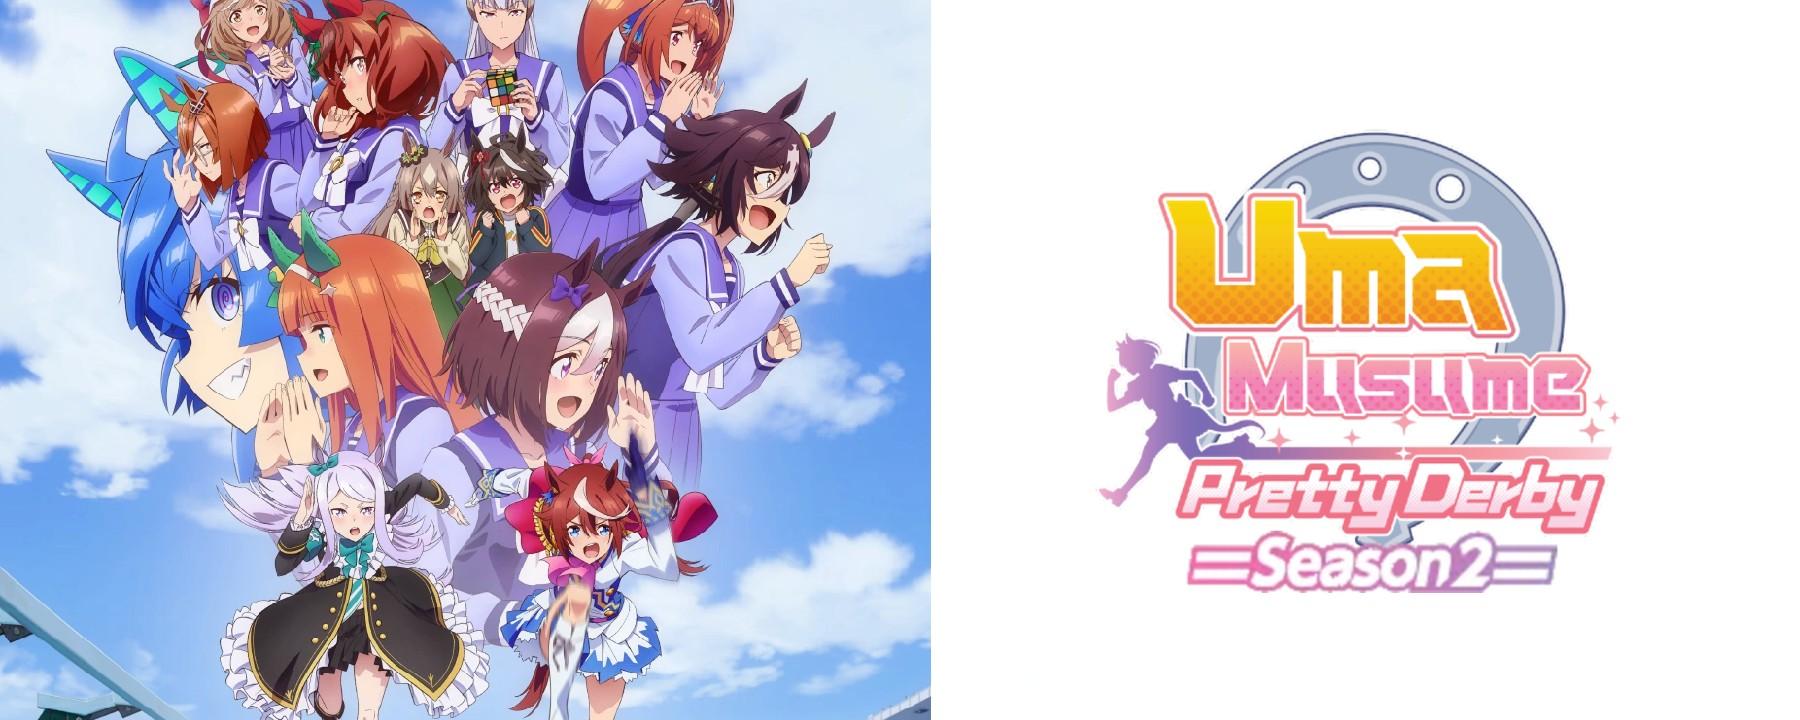 Anime Hajime Review: Uma Musume Pretty Derby Season 2